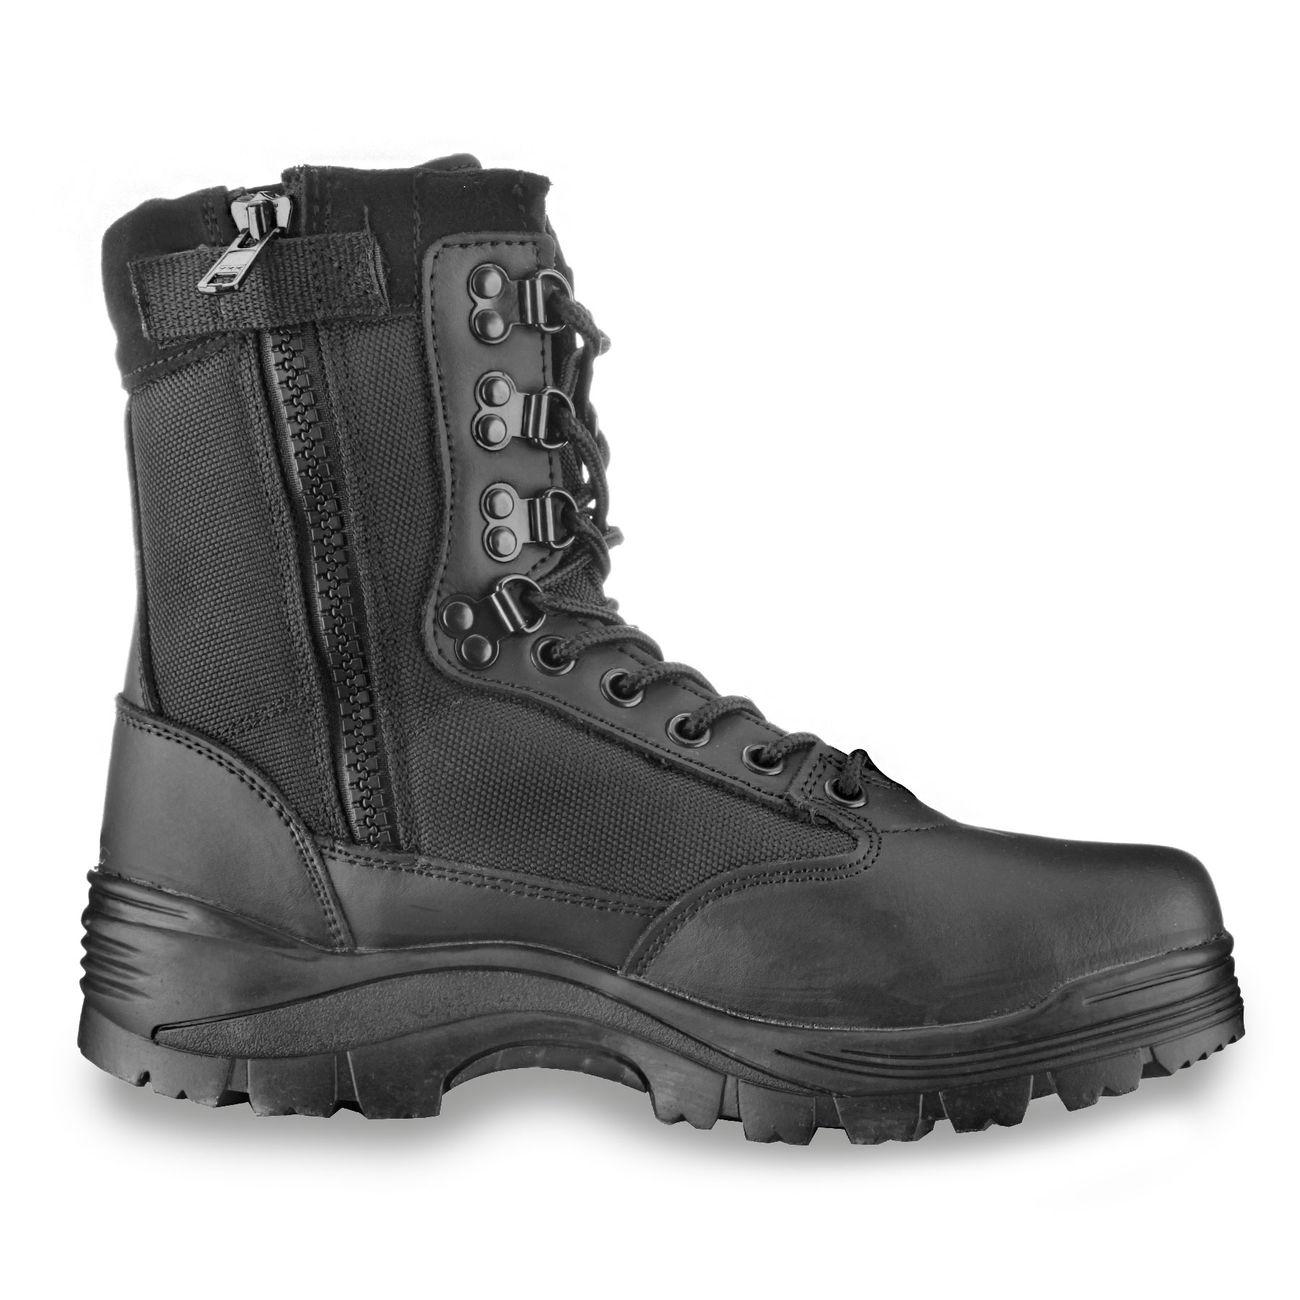 Mil Tec Stiefel Tactical Boots YKK Zipper schwarz